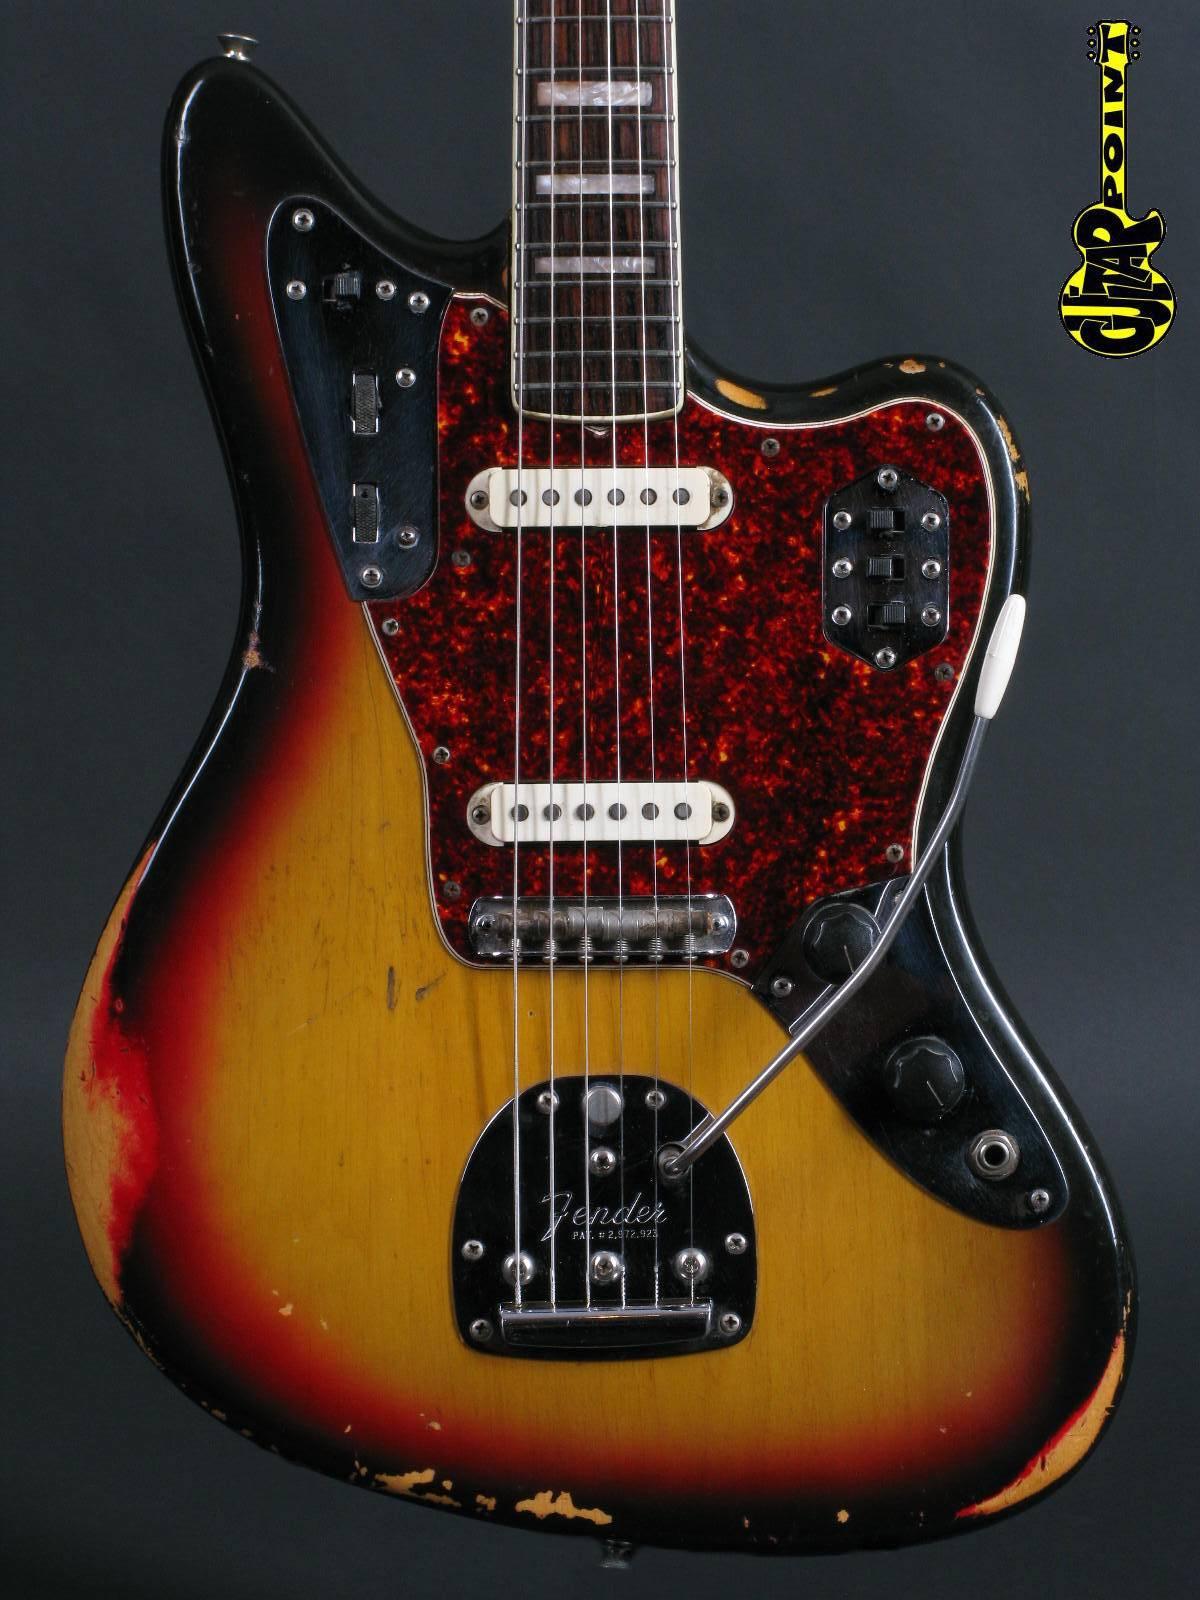 1972 Fender Jaguar – 3-tone Sunburst